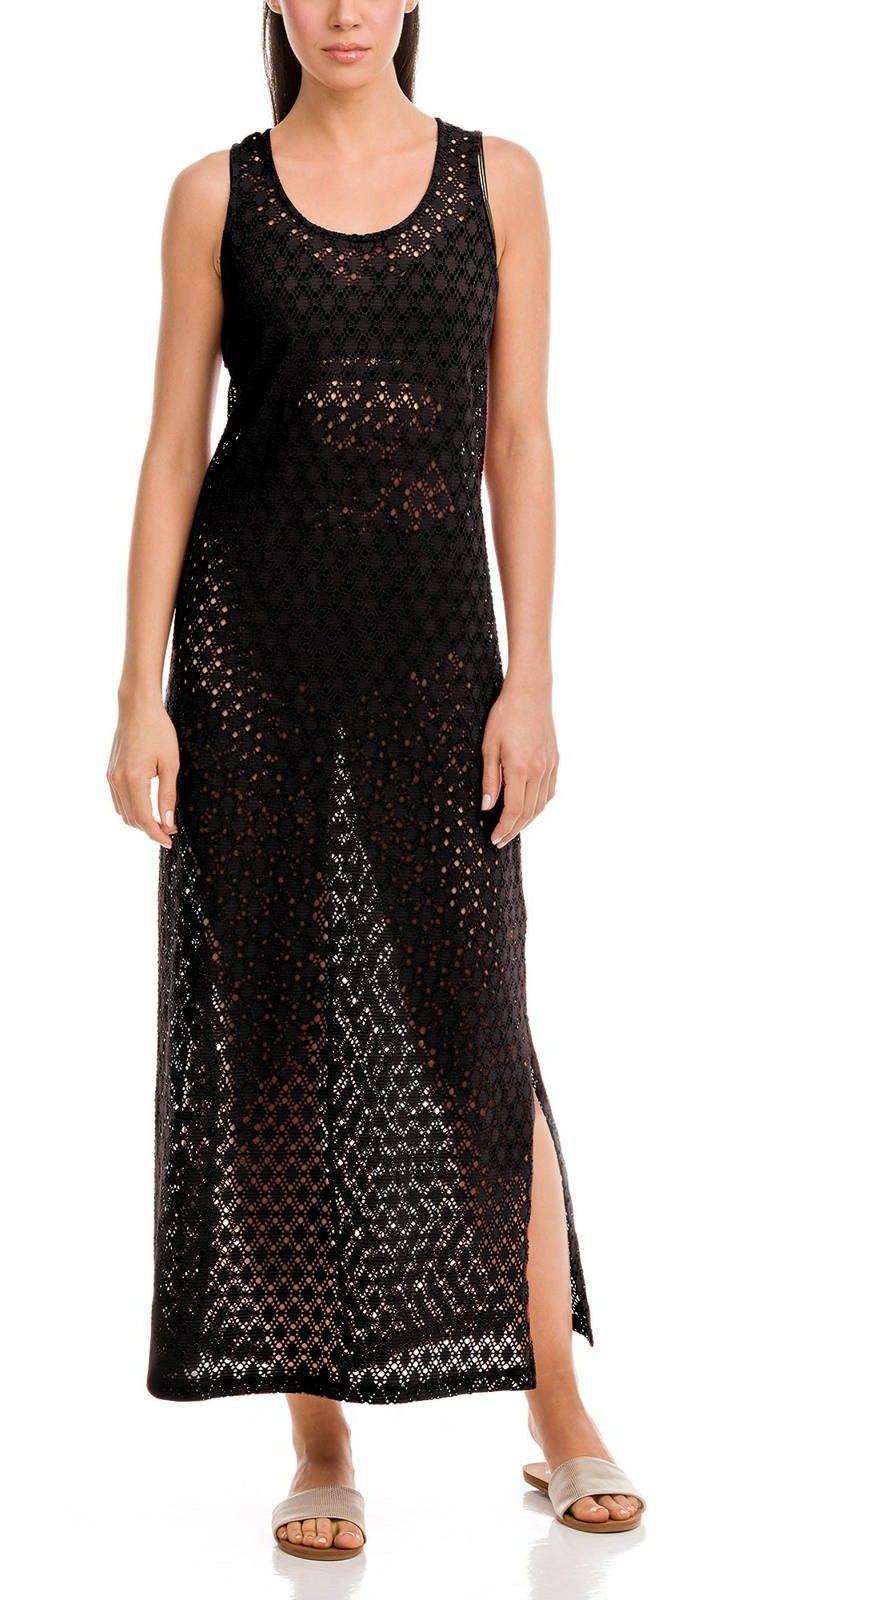 Sukienka plażowa Vamp Narcissa 12575 kolor 100